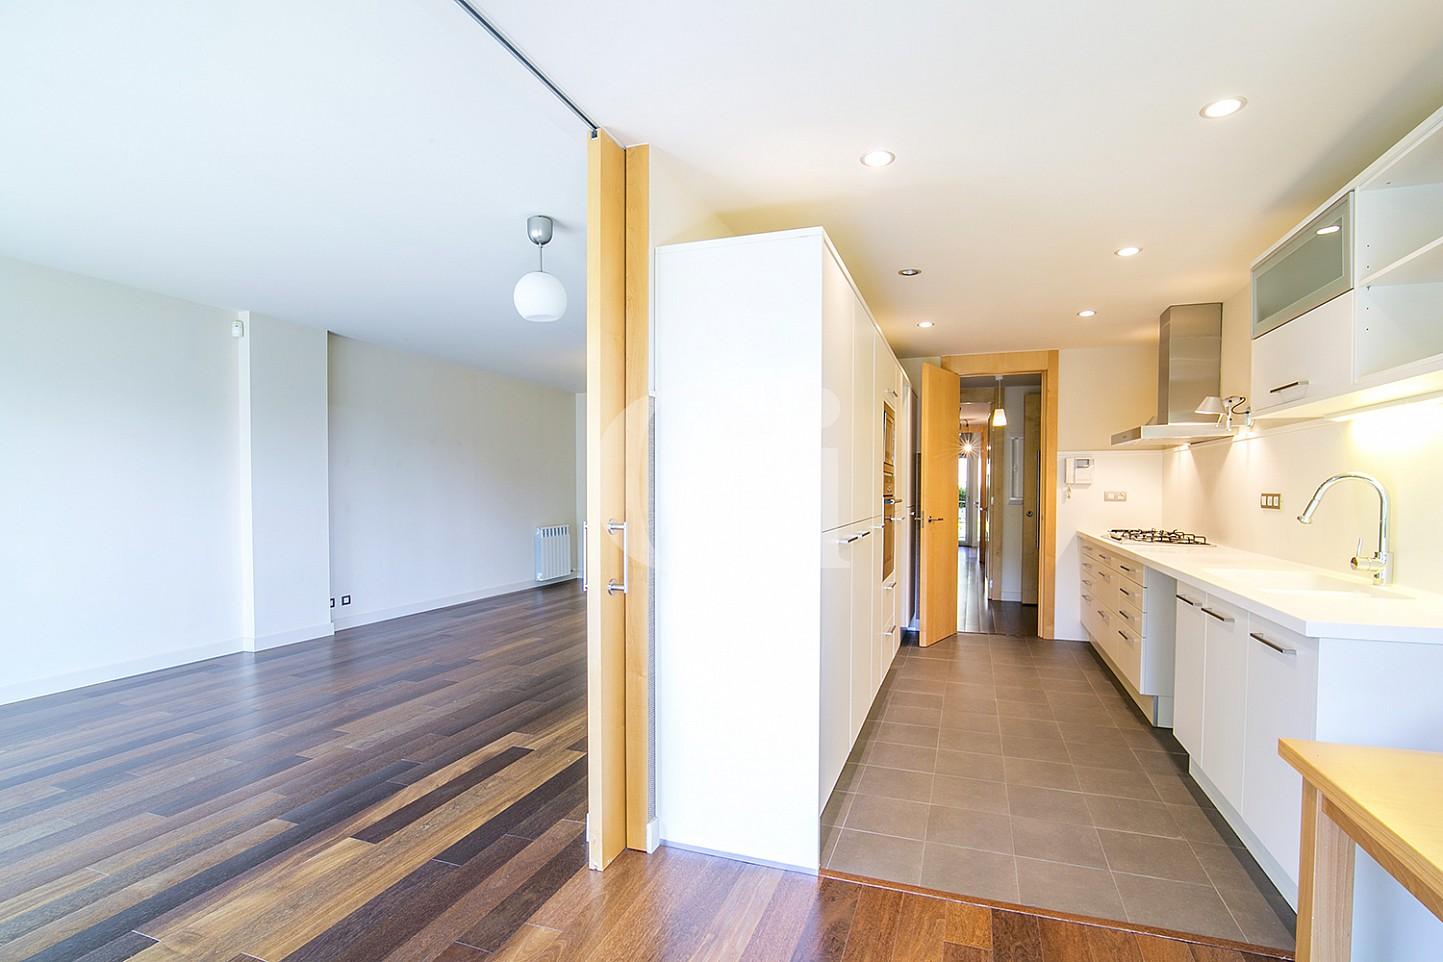 Pasillo de precioso apartamento en venta en Saria, Barcelona